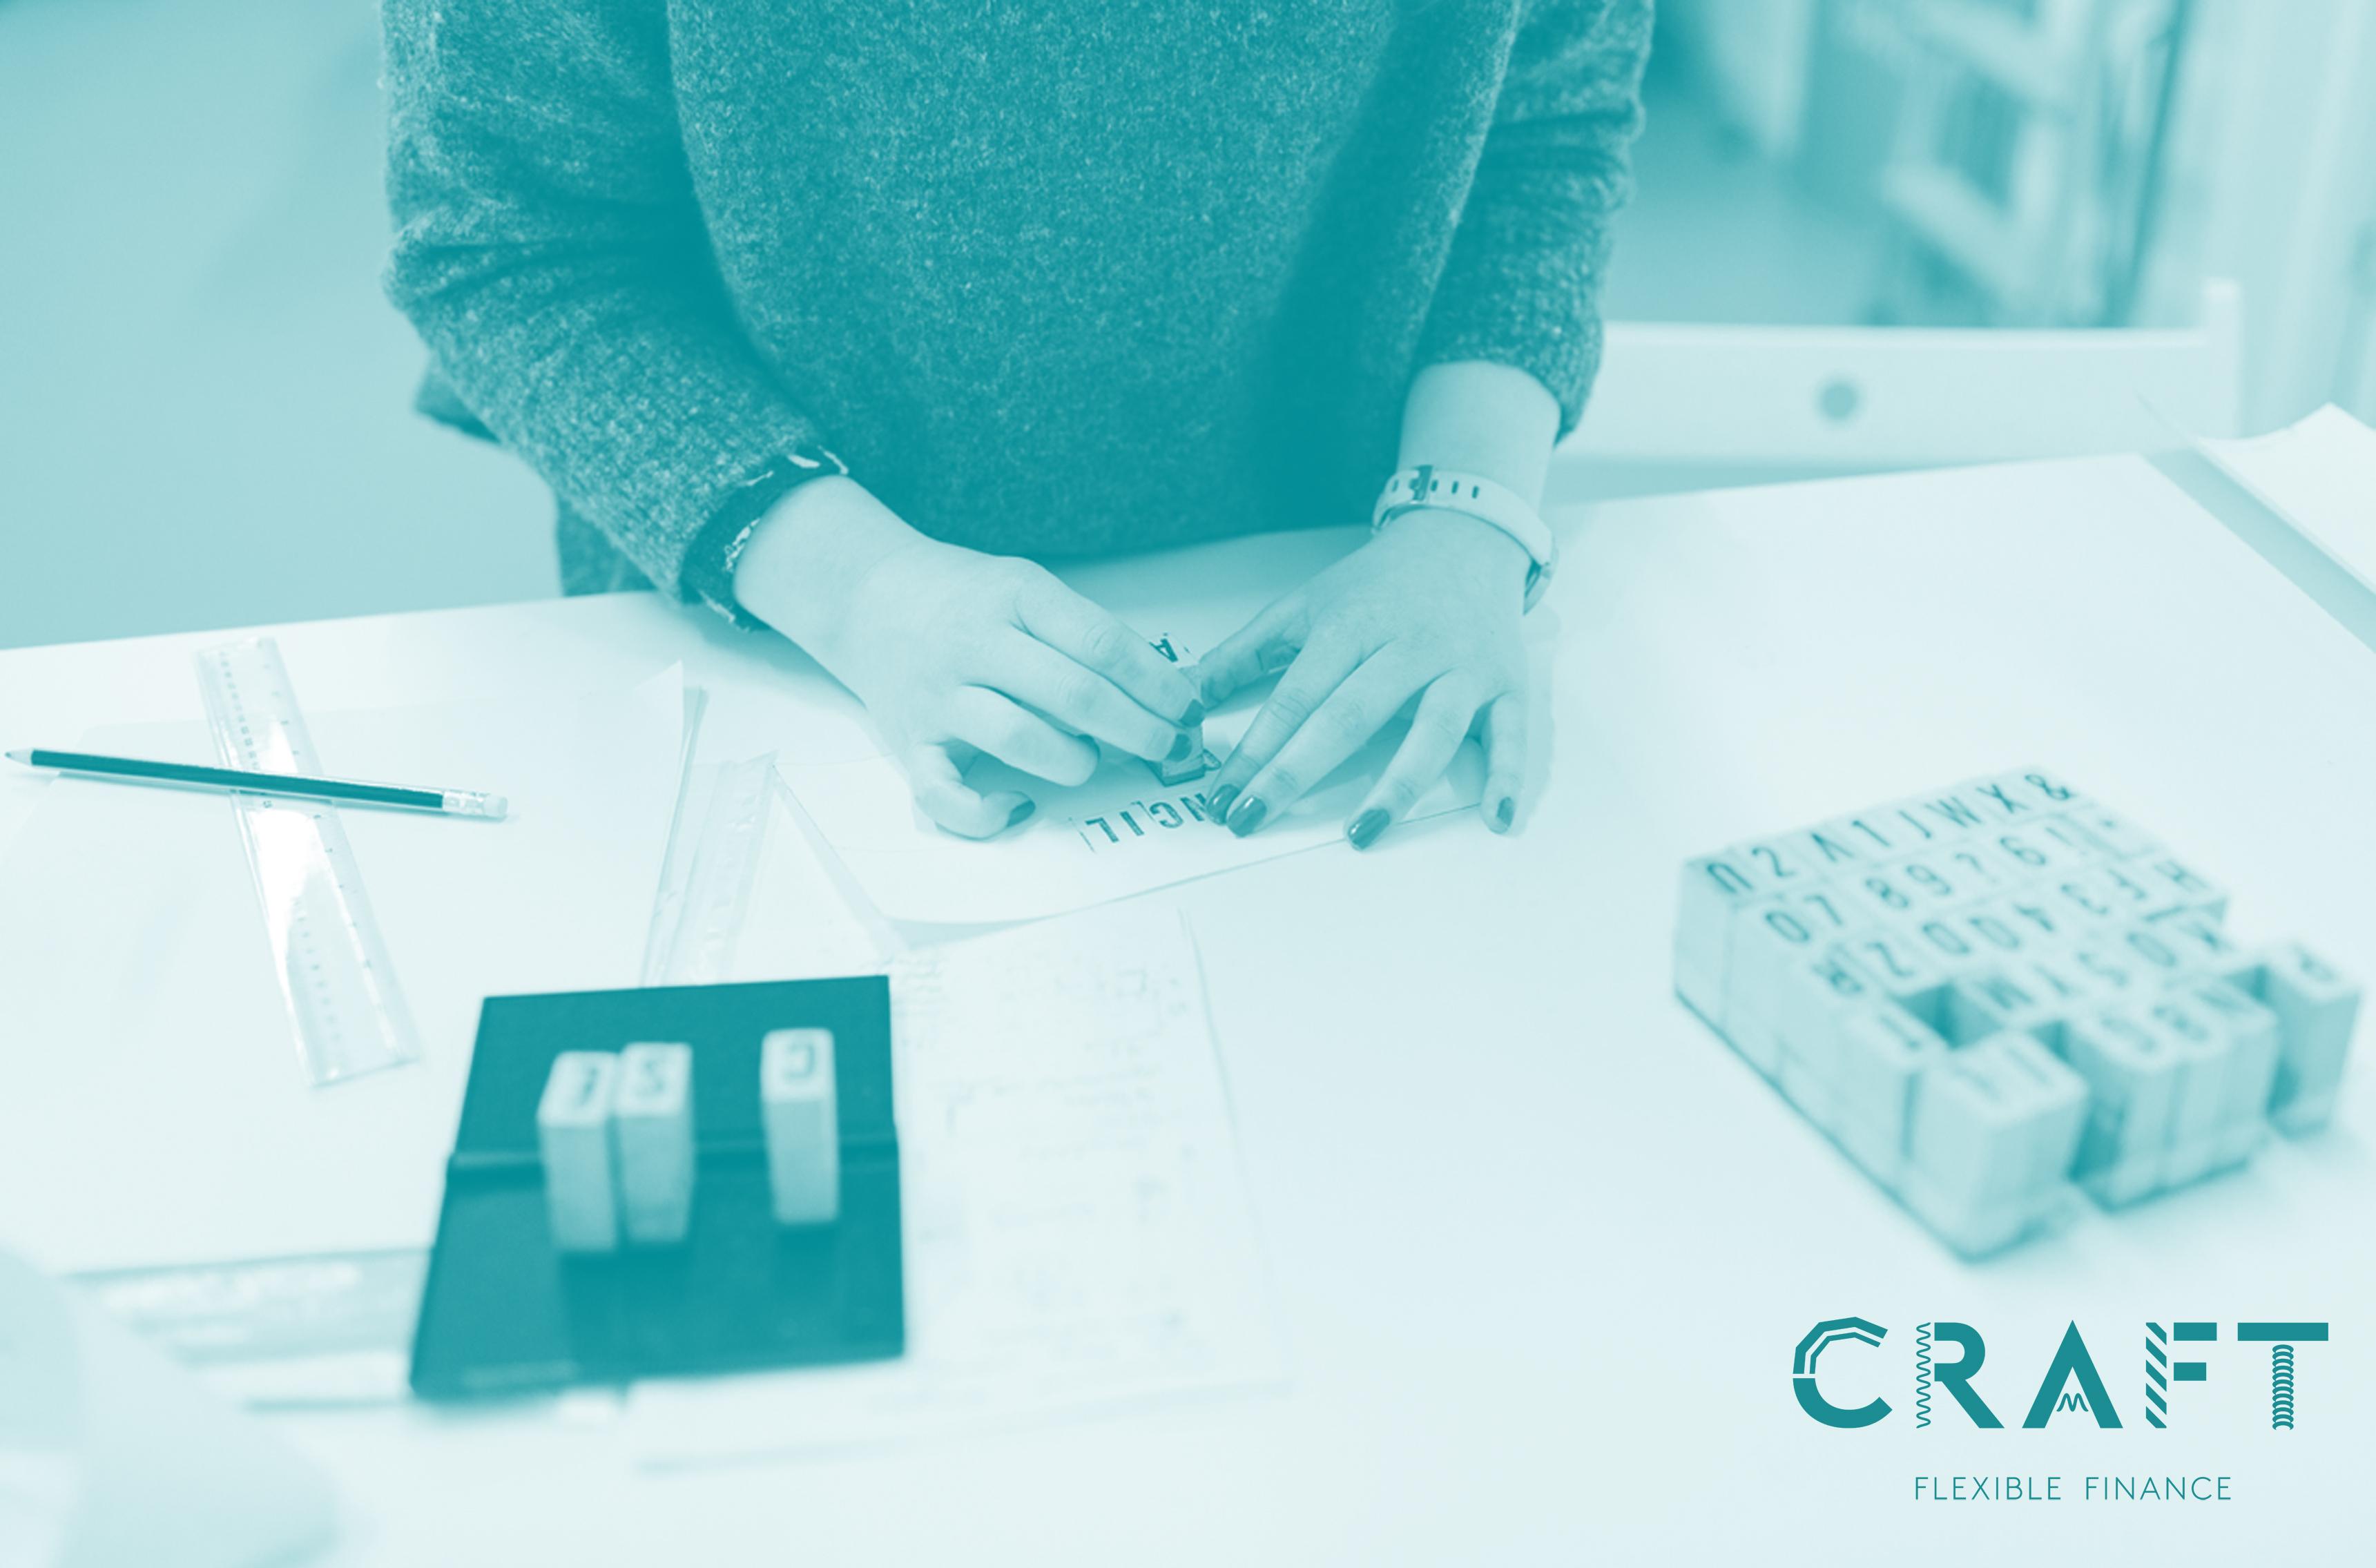 CRAFT Flexible Finance